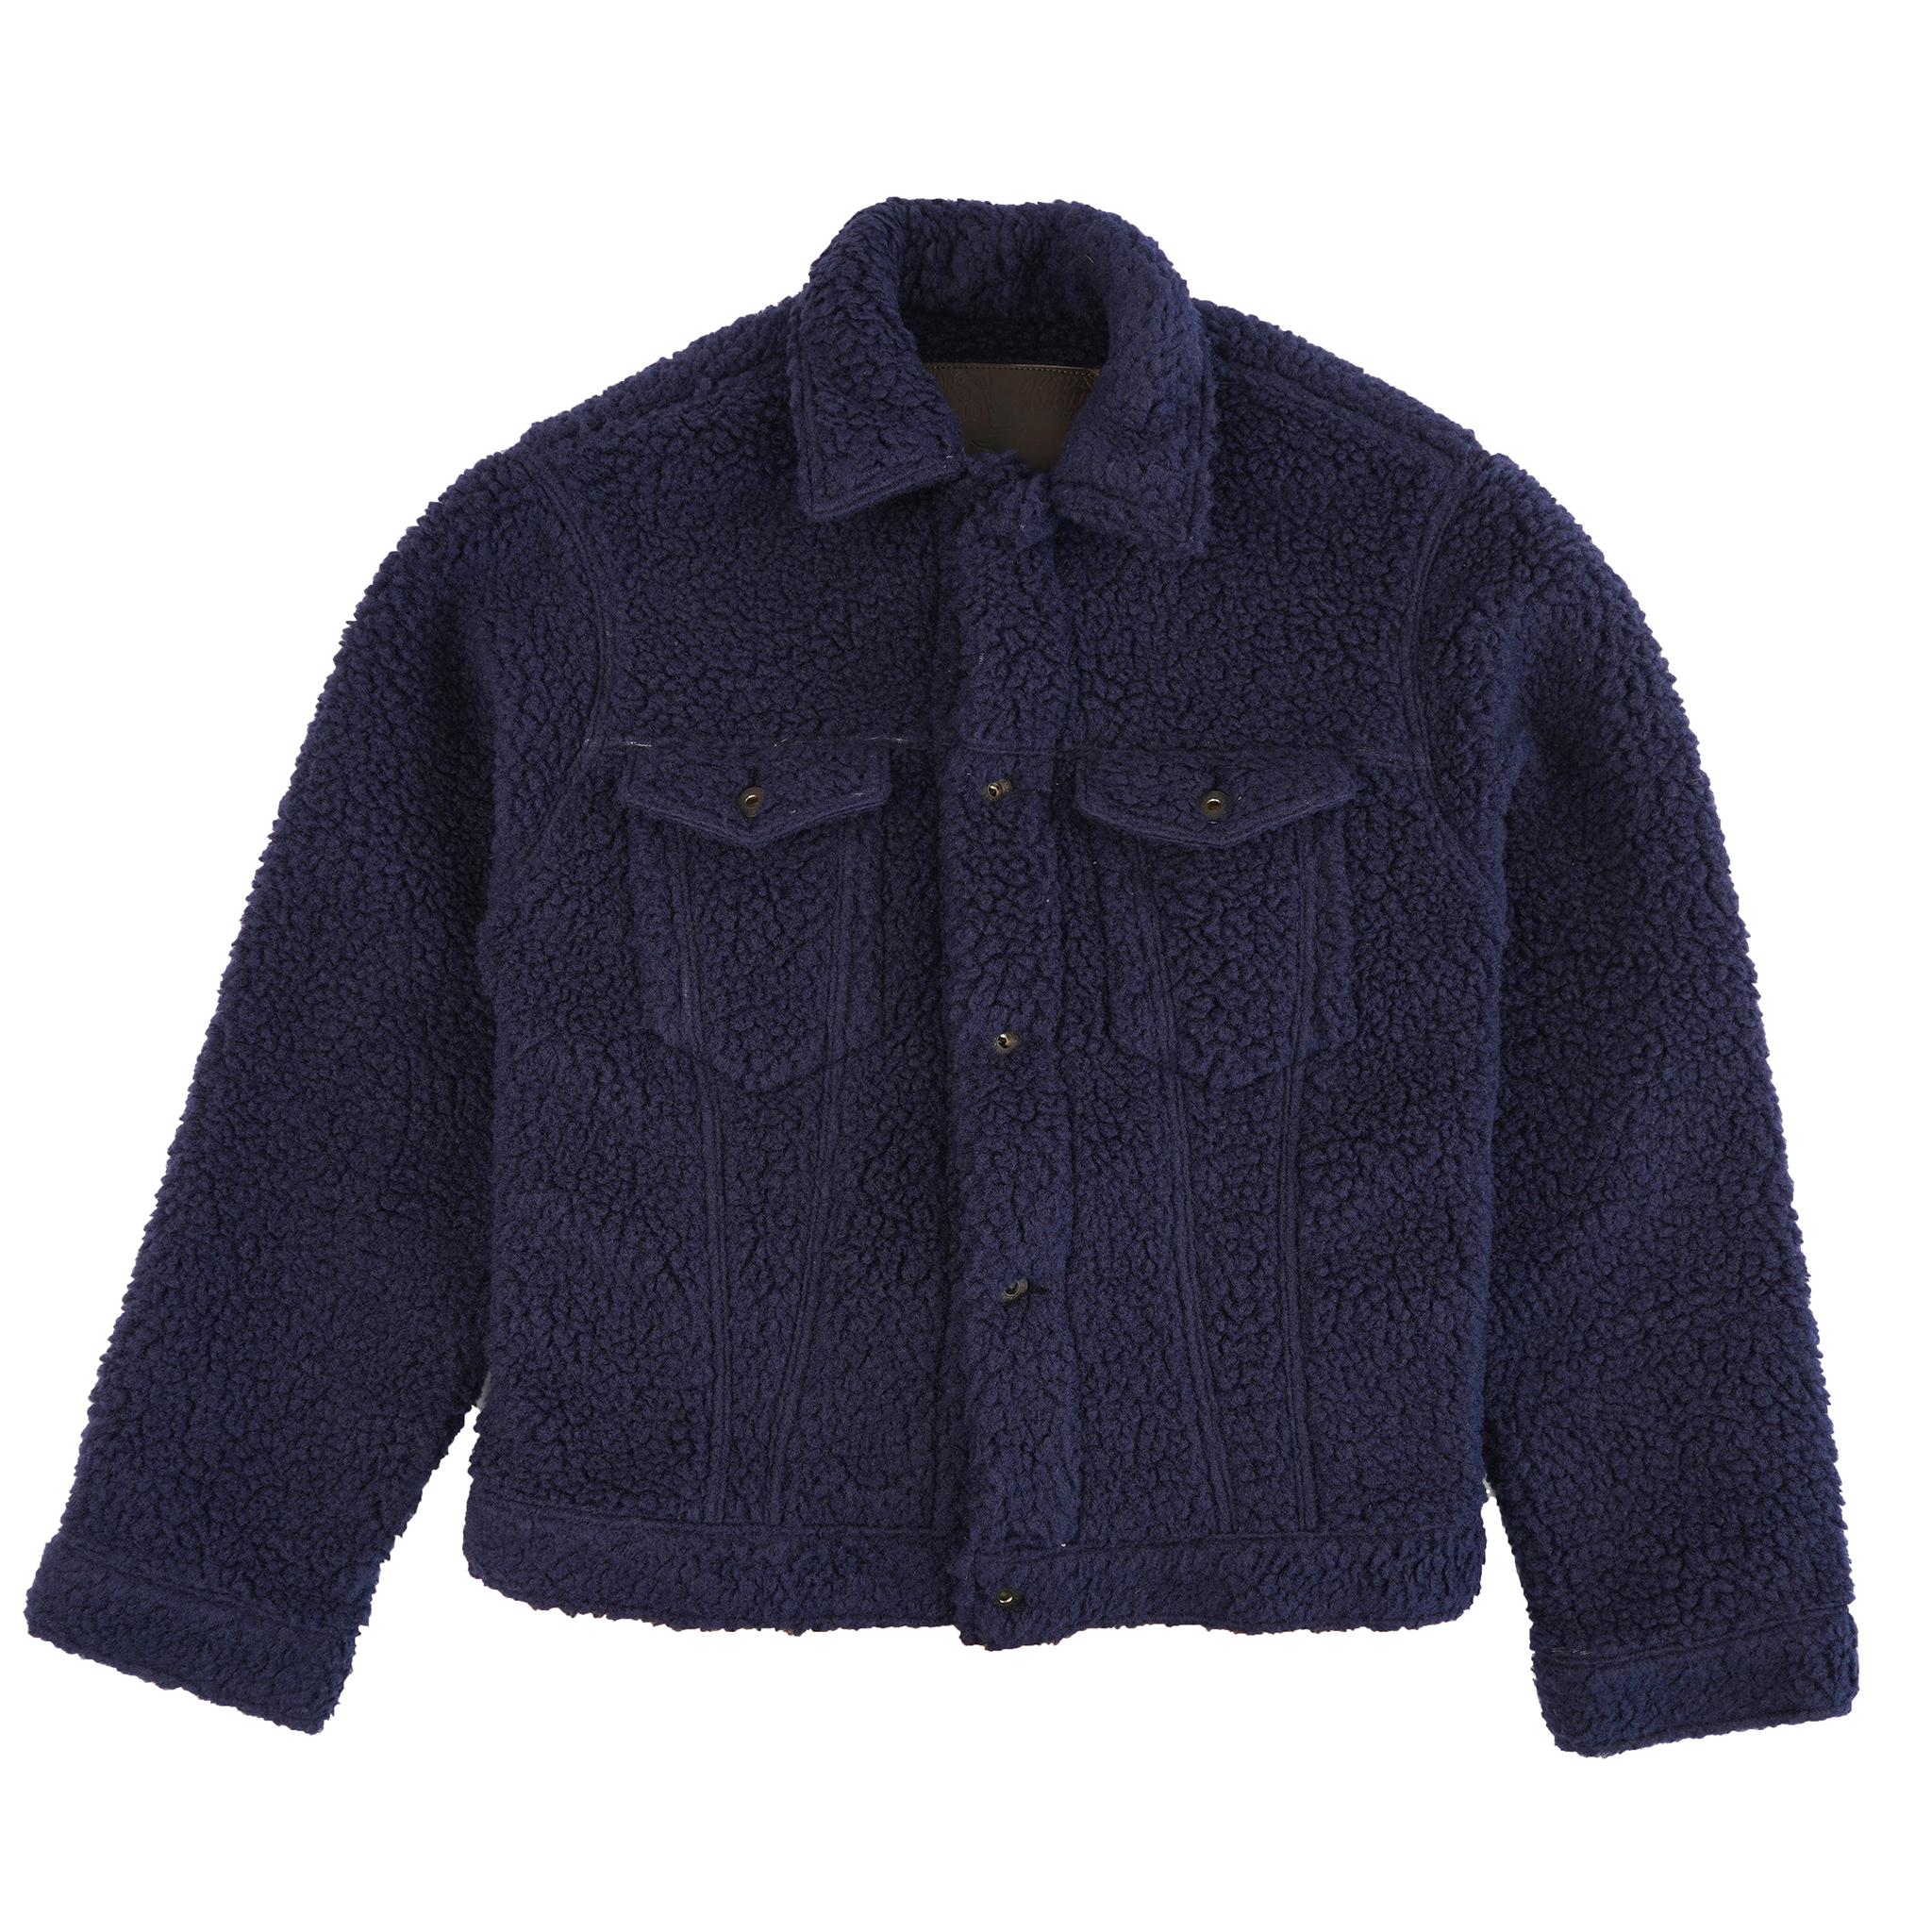 Sherpa Fleece - Navy - Denim Jacket